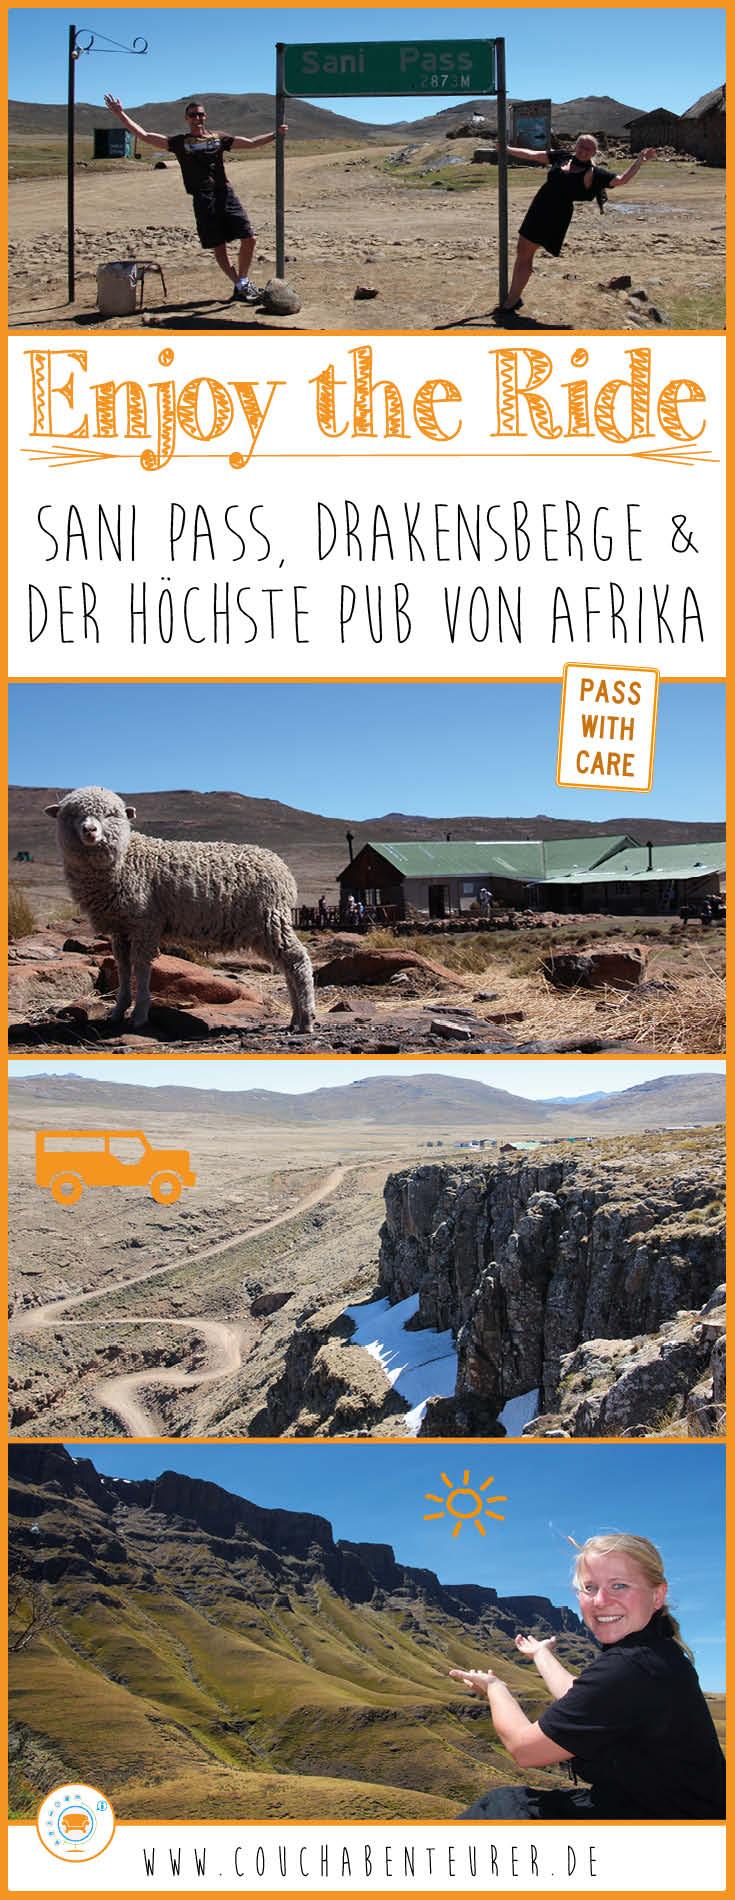 Lesotho_SaniPass_Drakensberge